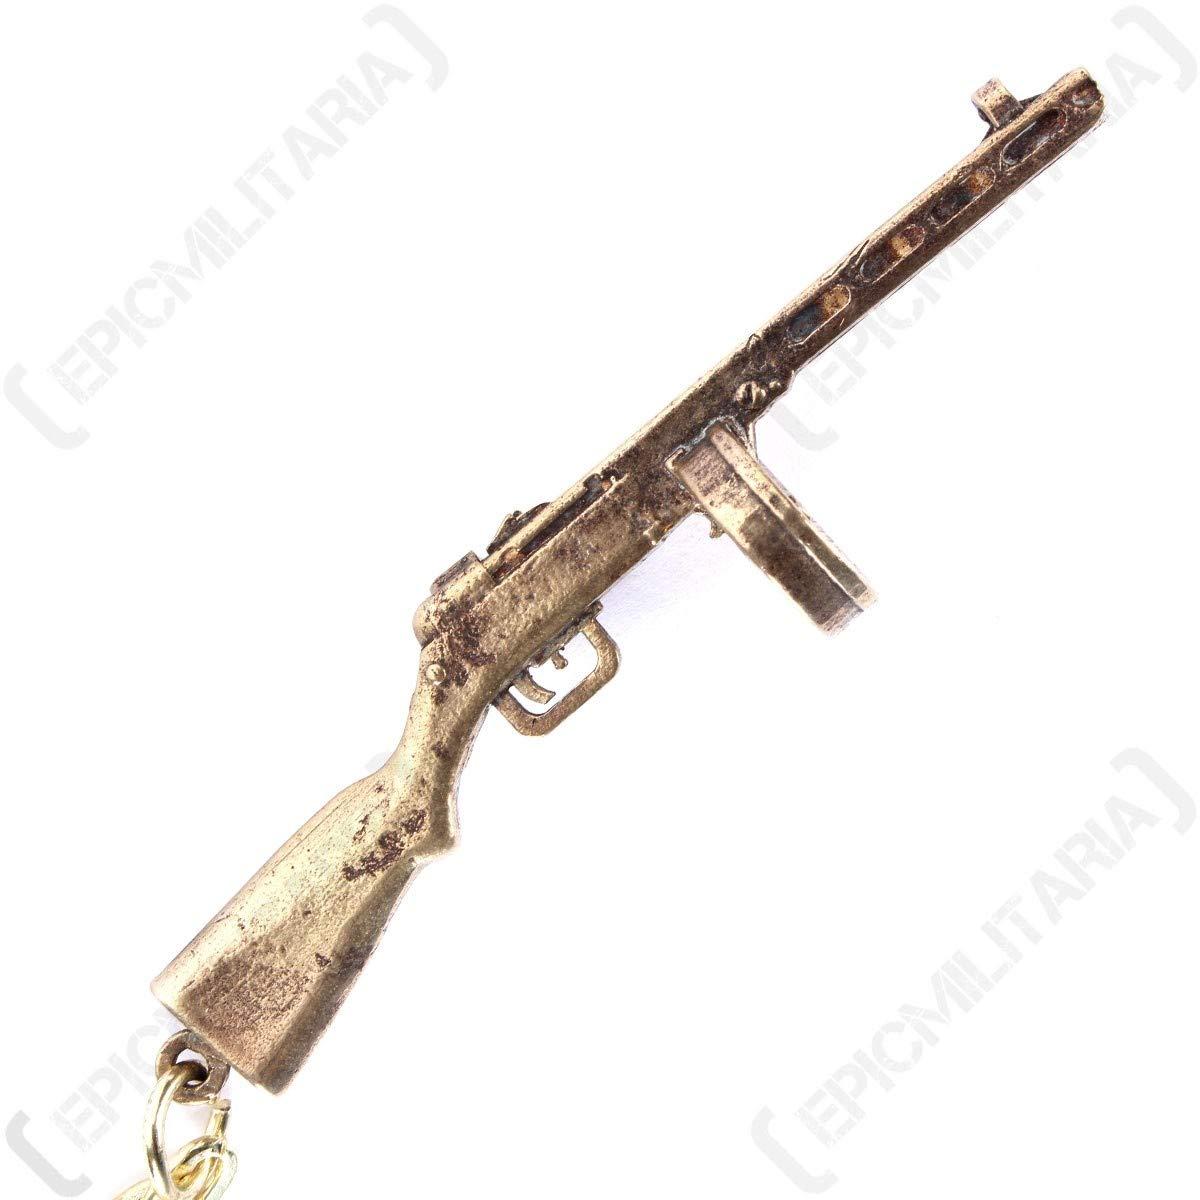 Amazon.com: Epic Militaria PPSh 41 - Llavero con pistola: Shoes